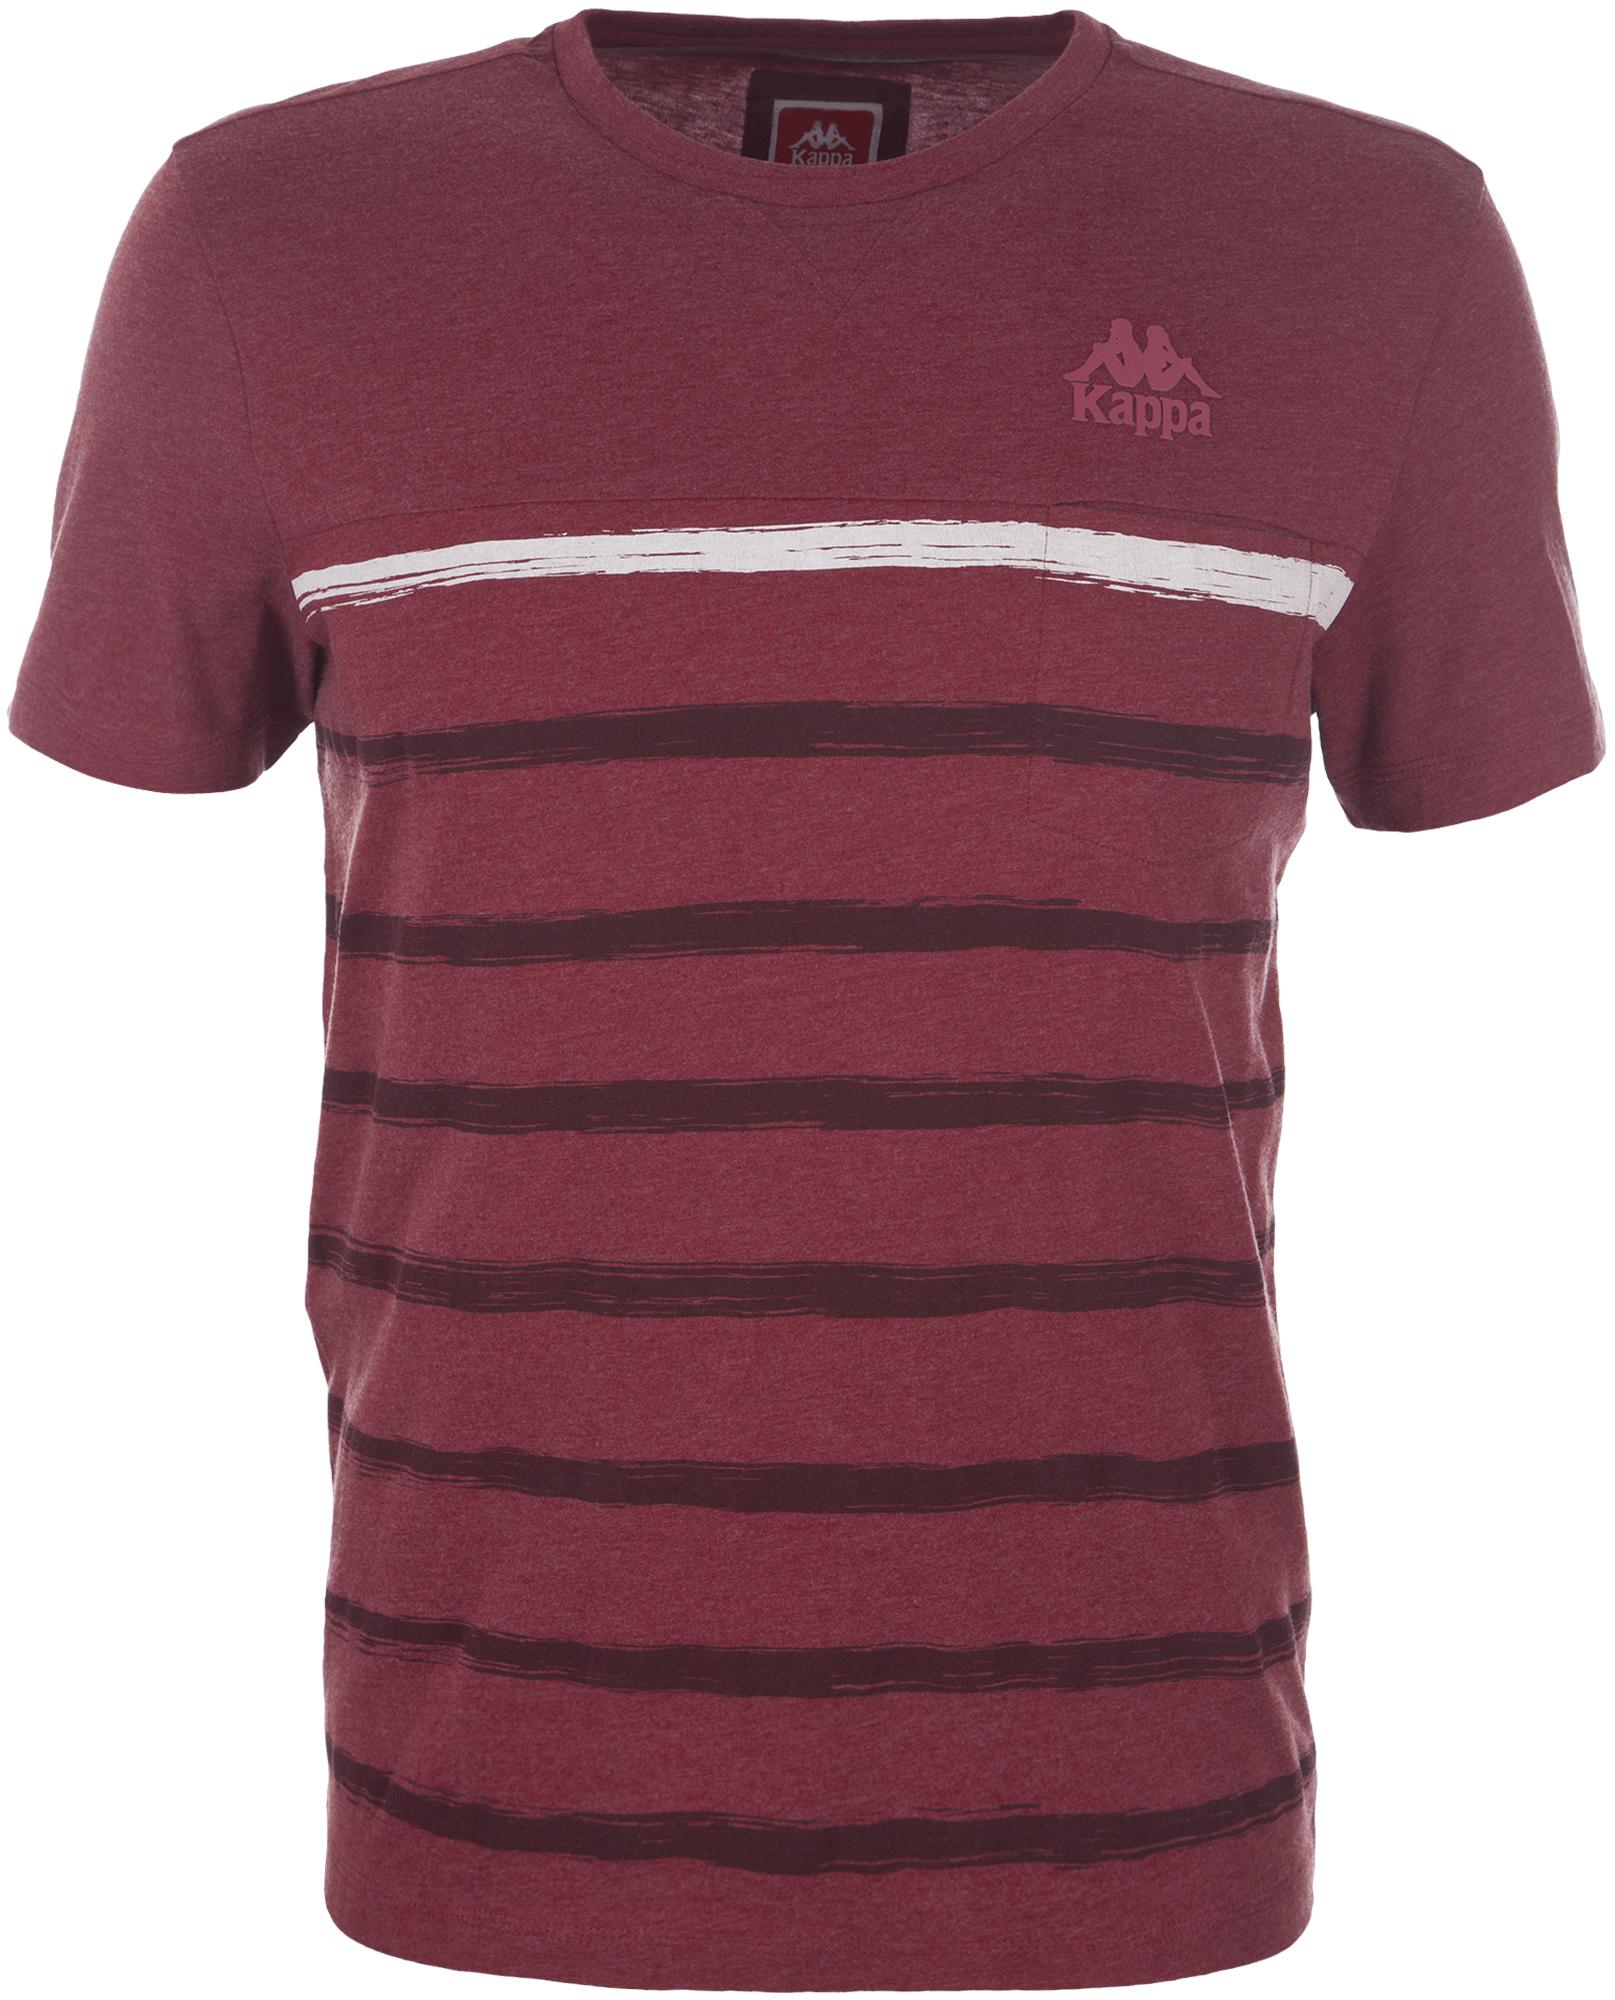 Kappa Футболка мужская Kappa, размер 50 спортивная футболка kappa km512tn30